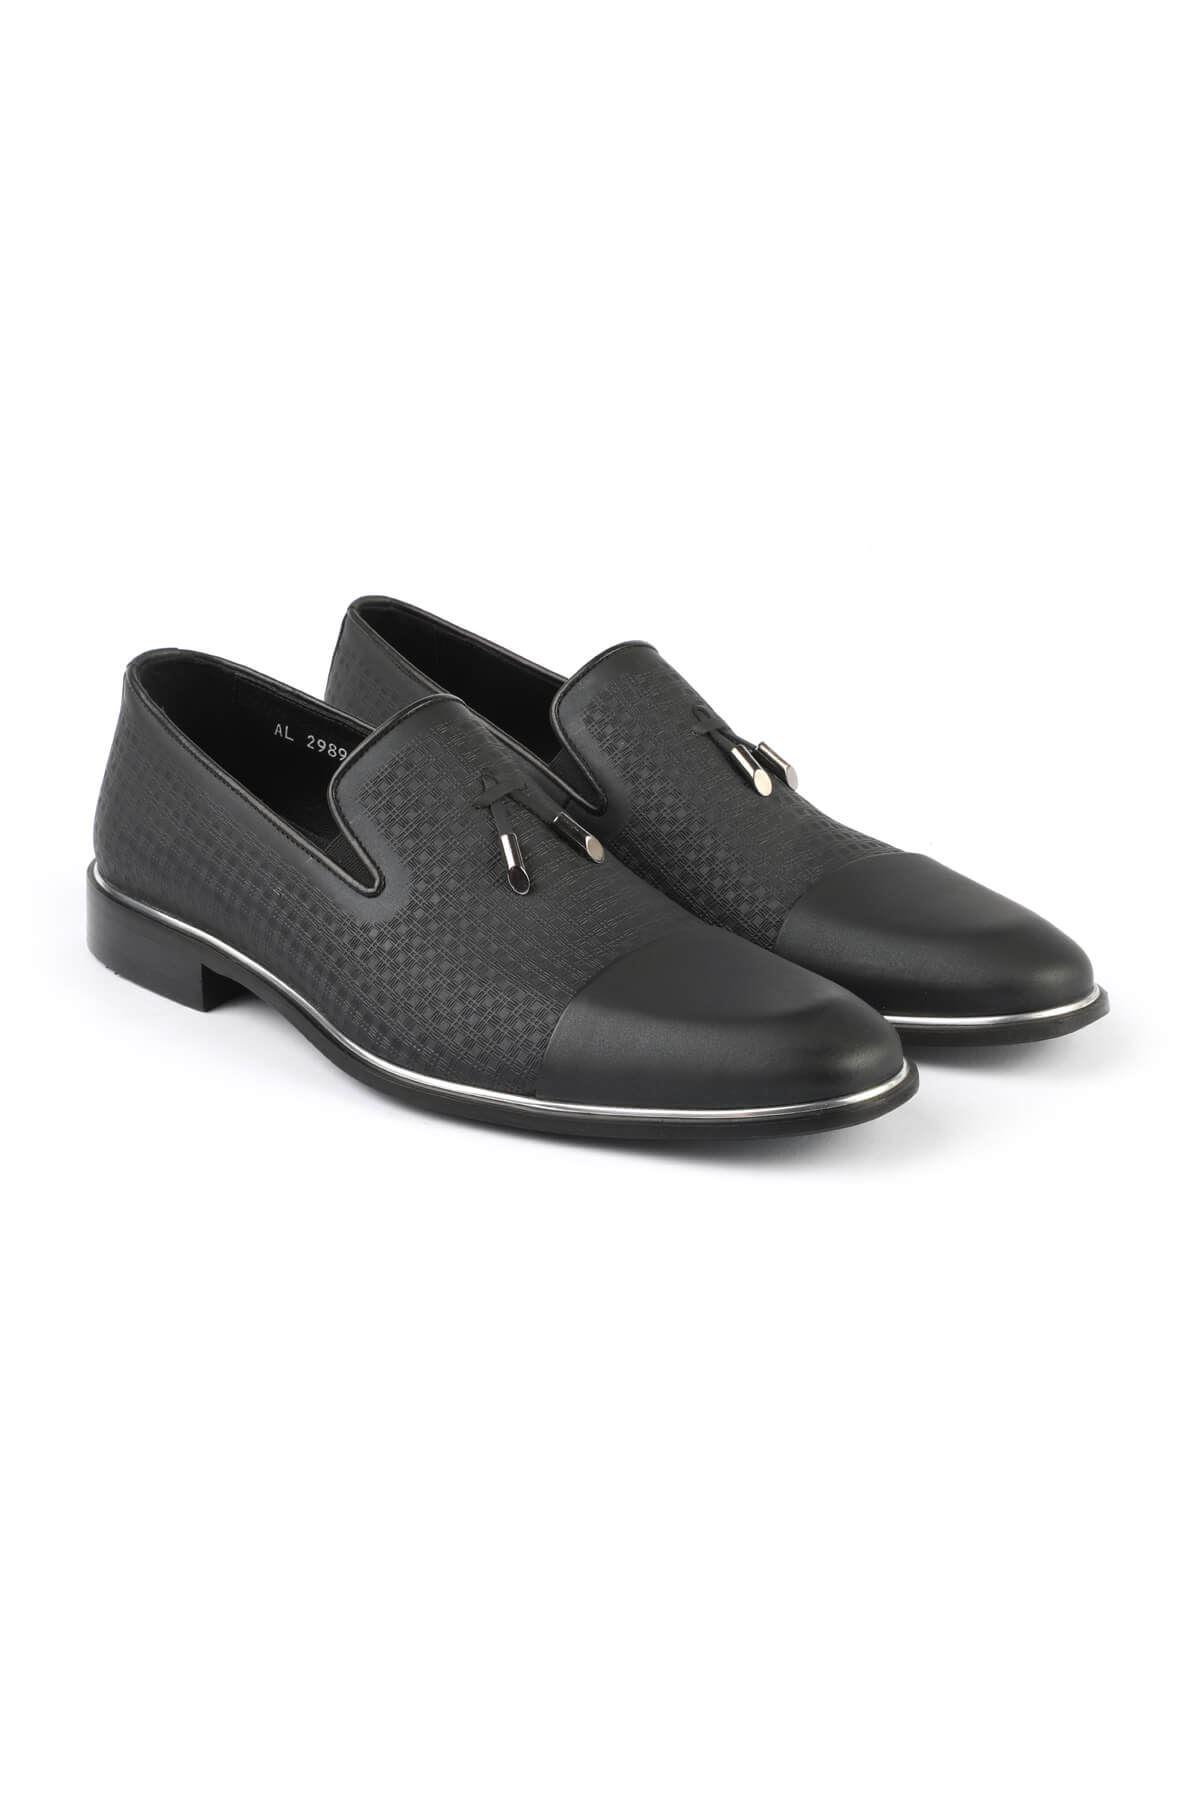 Libero 2989 Black Classic Shoes